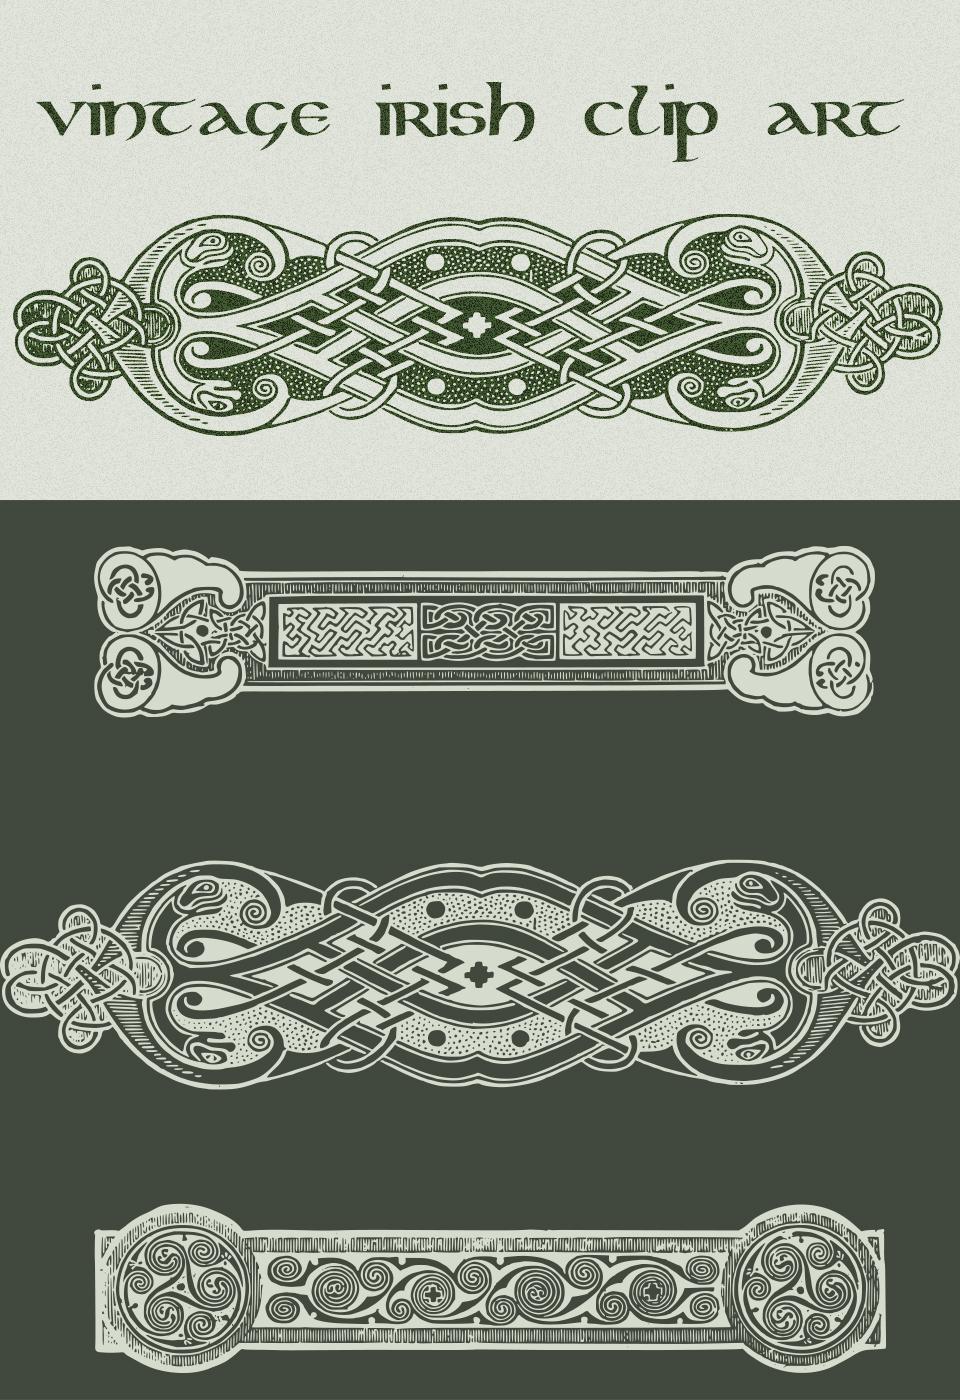 Vintage Irish Clip Art